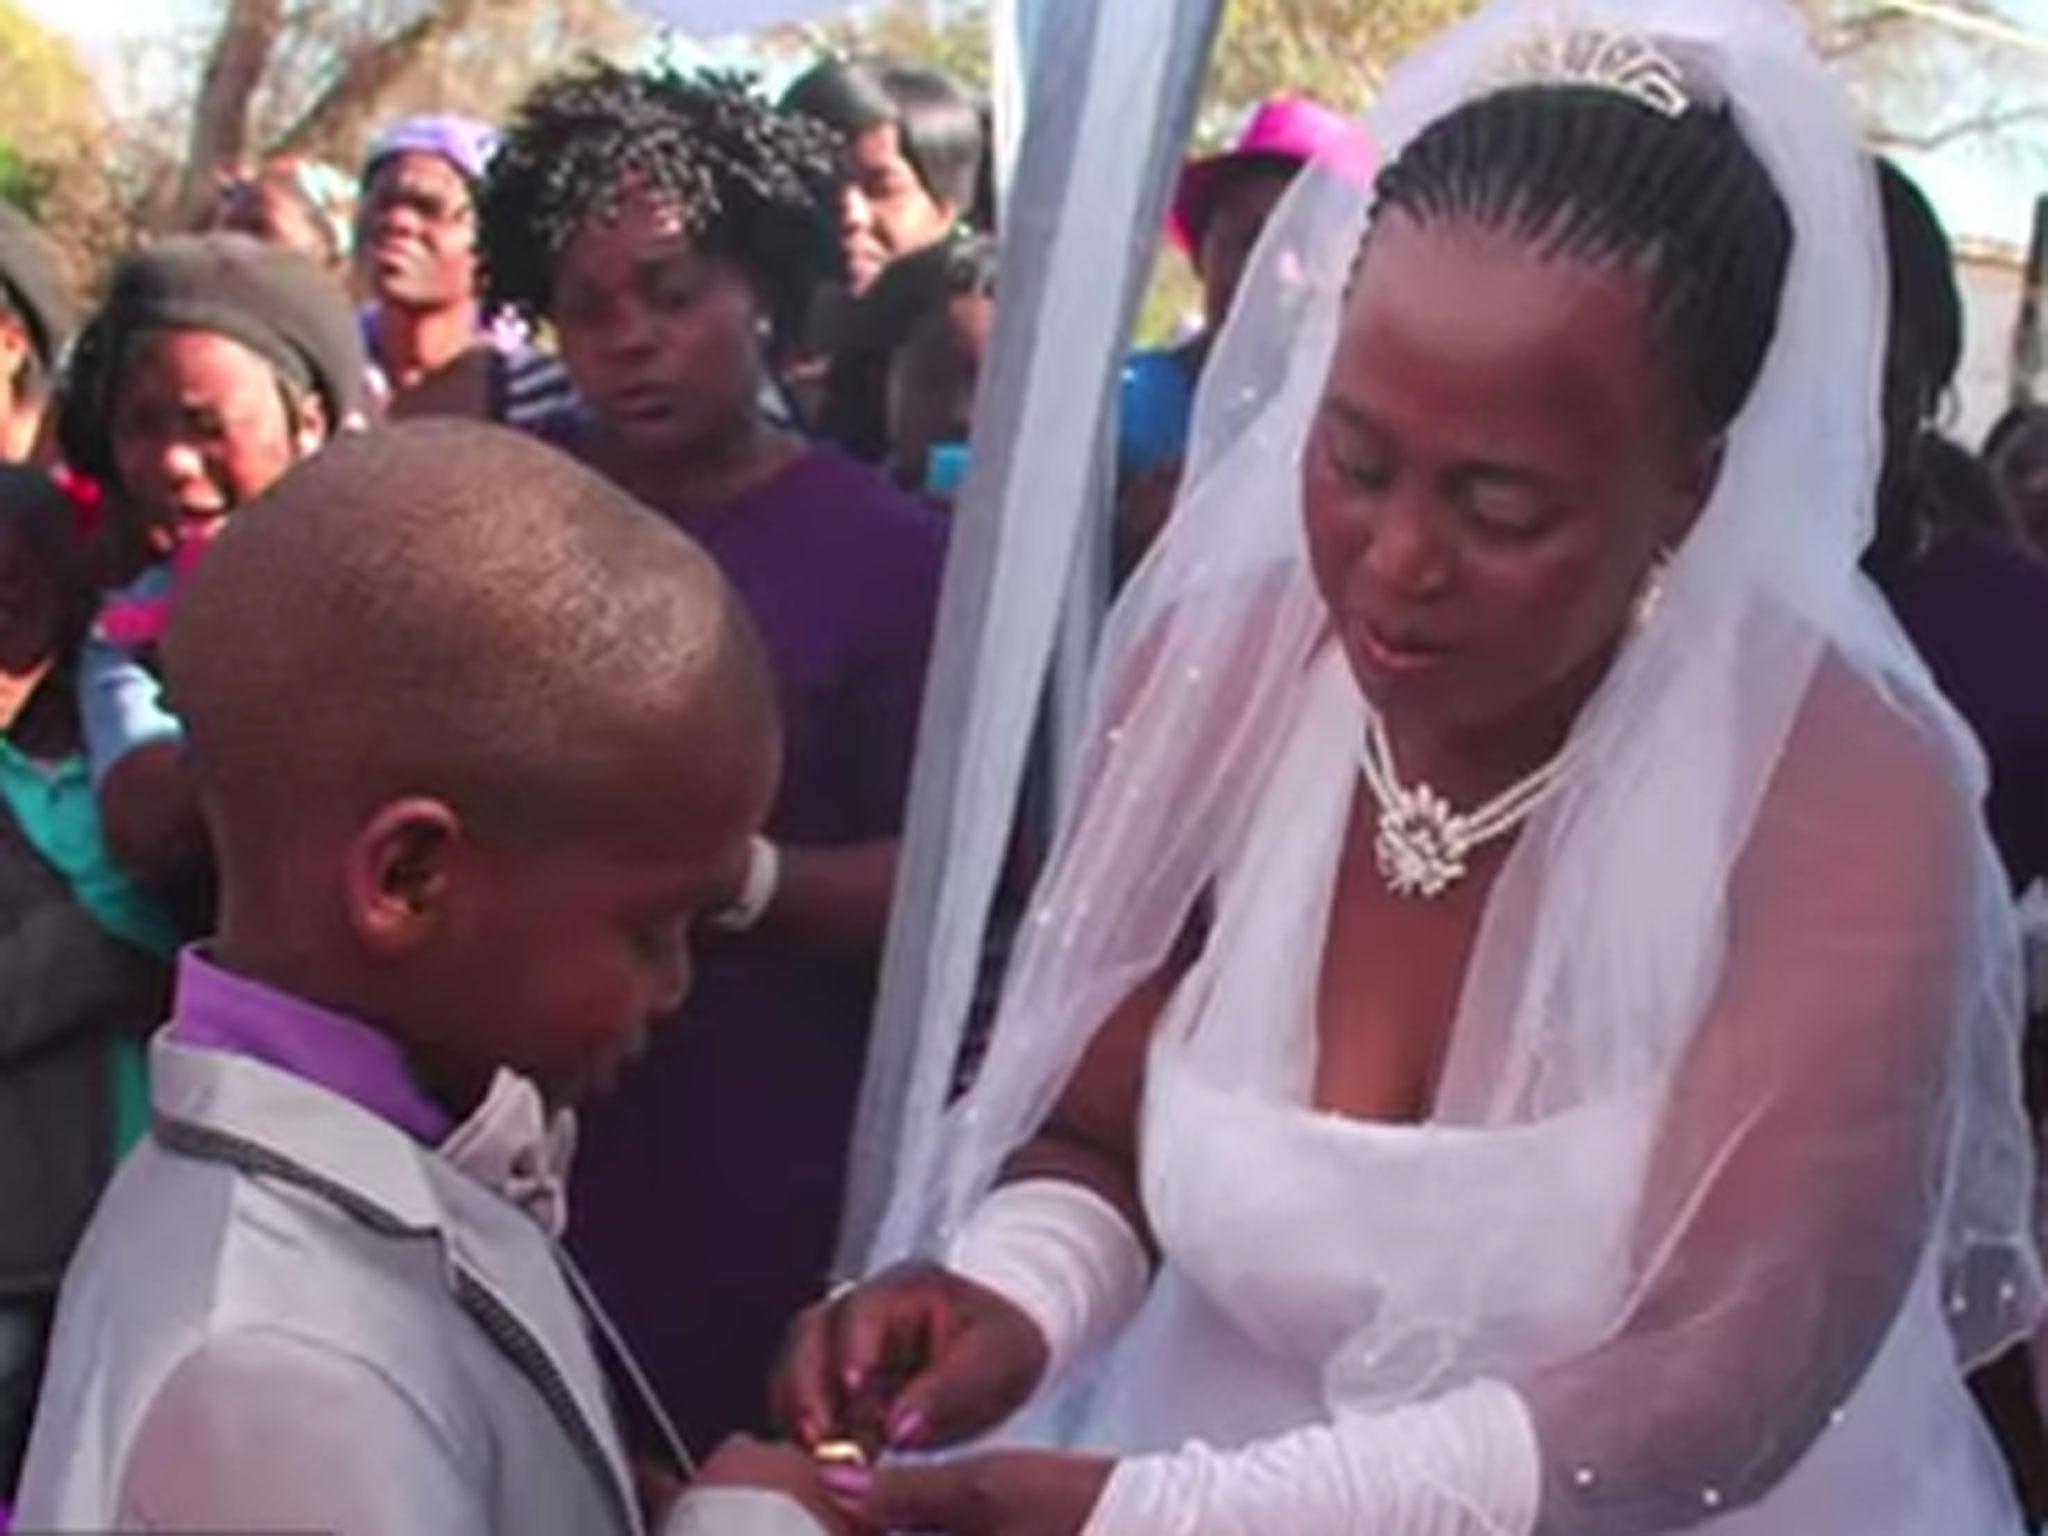 Saneie Masilela, 9, Marries Helen Shabangu, 53 Years His